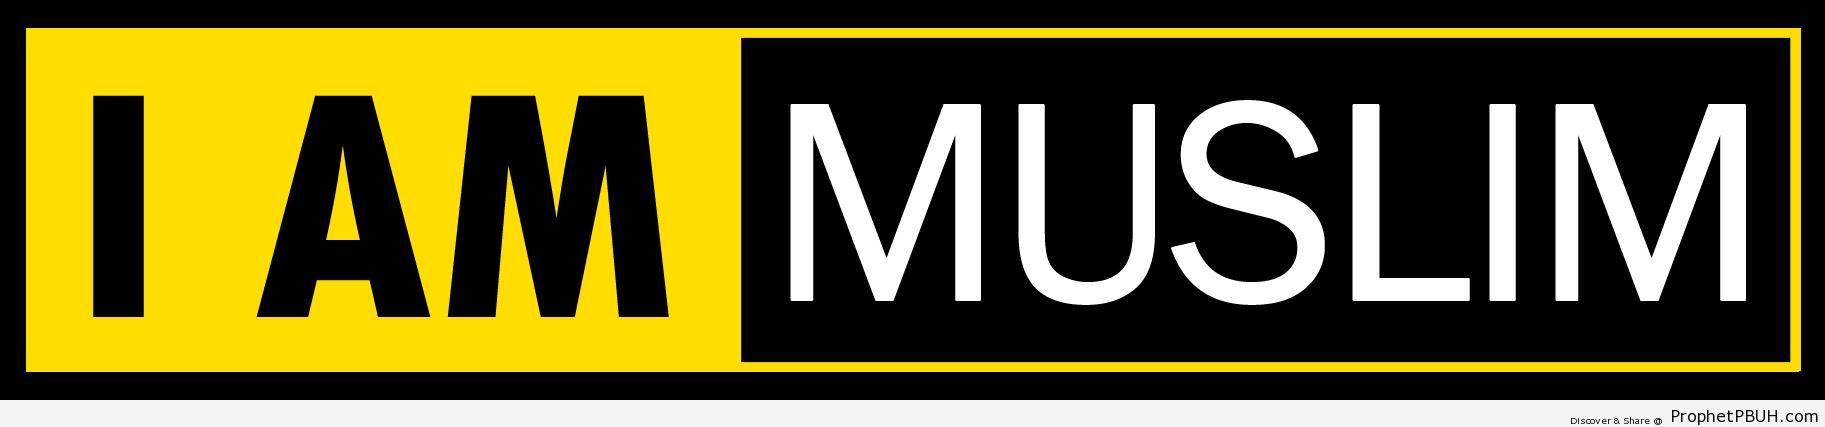 I AM MUSLIM Sticker - Uncategorized